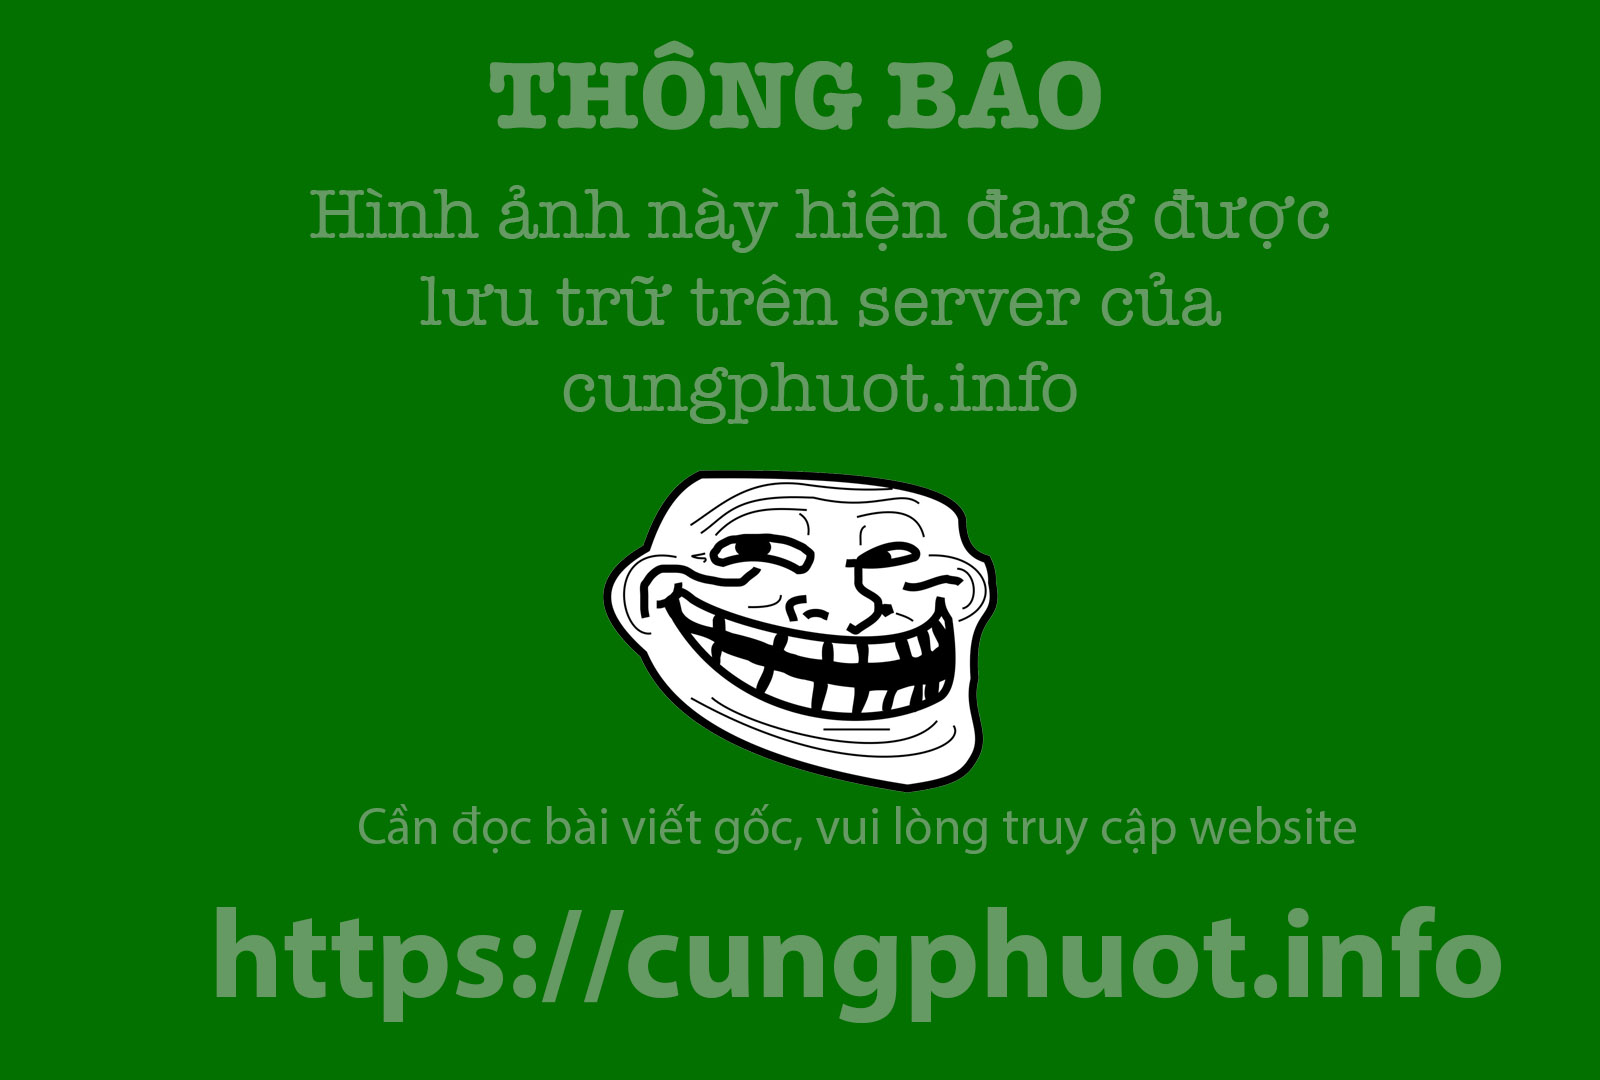 Co do Hue dep la trong suong mu hinh anh 7